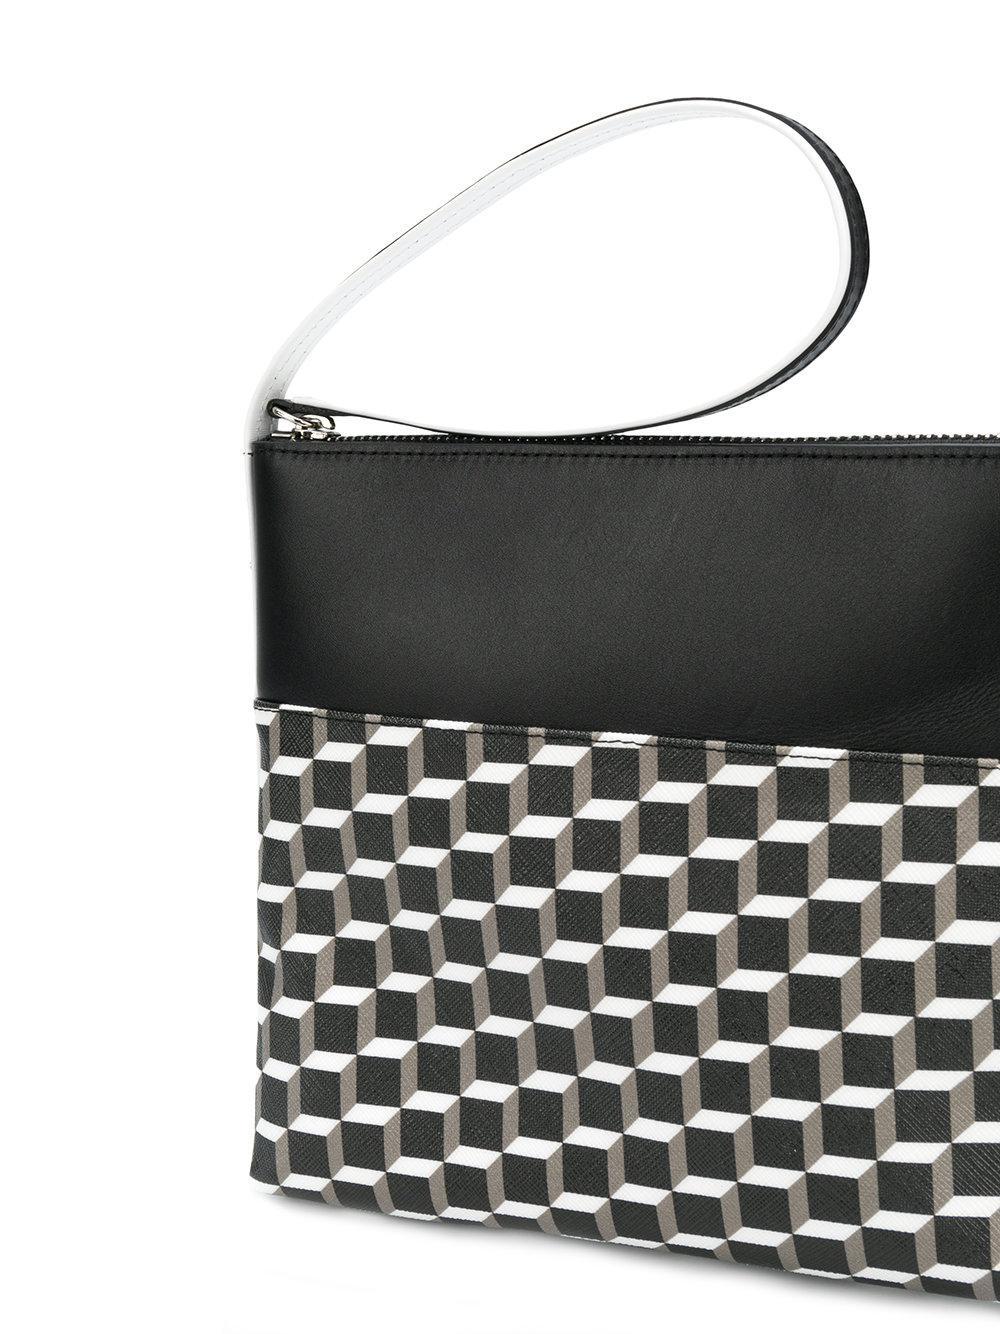 Pre-owned - Black Suede Clutch bag Pierre Hardy Lub79